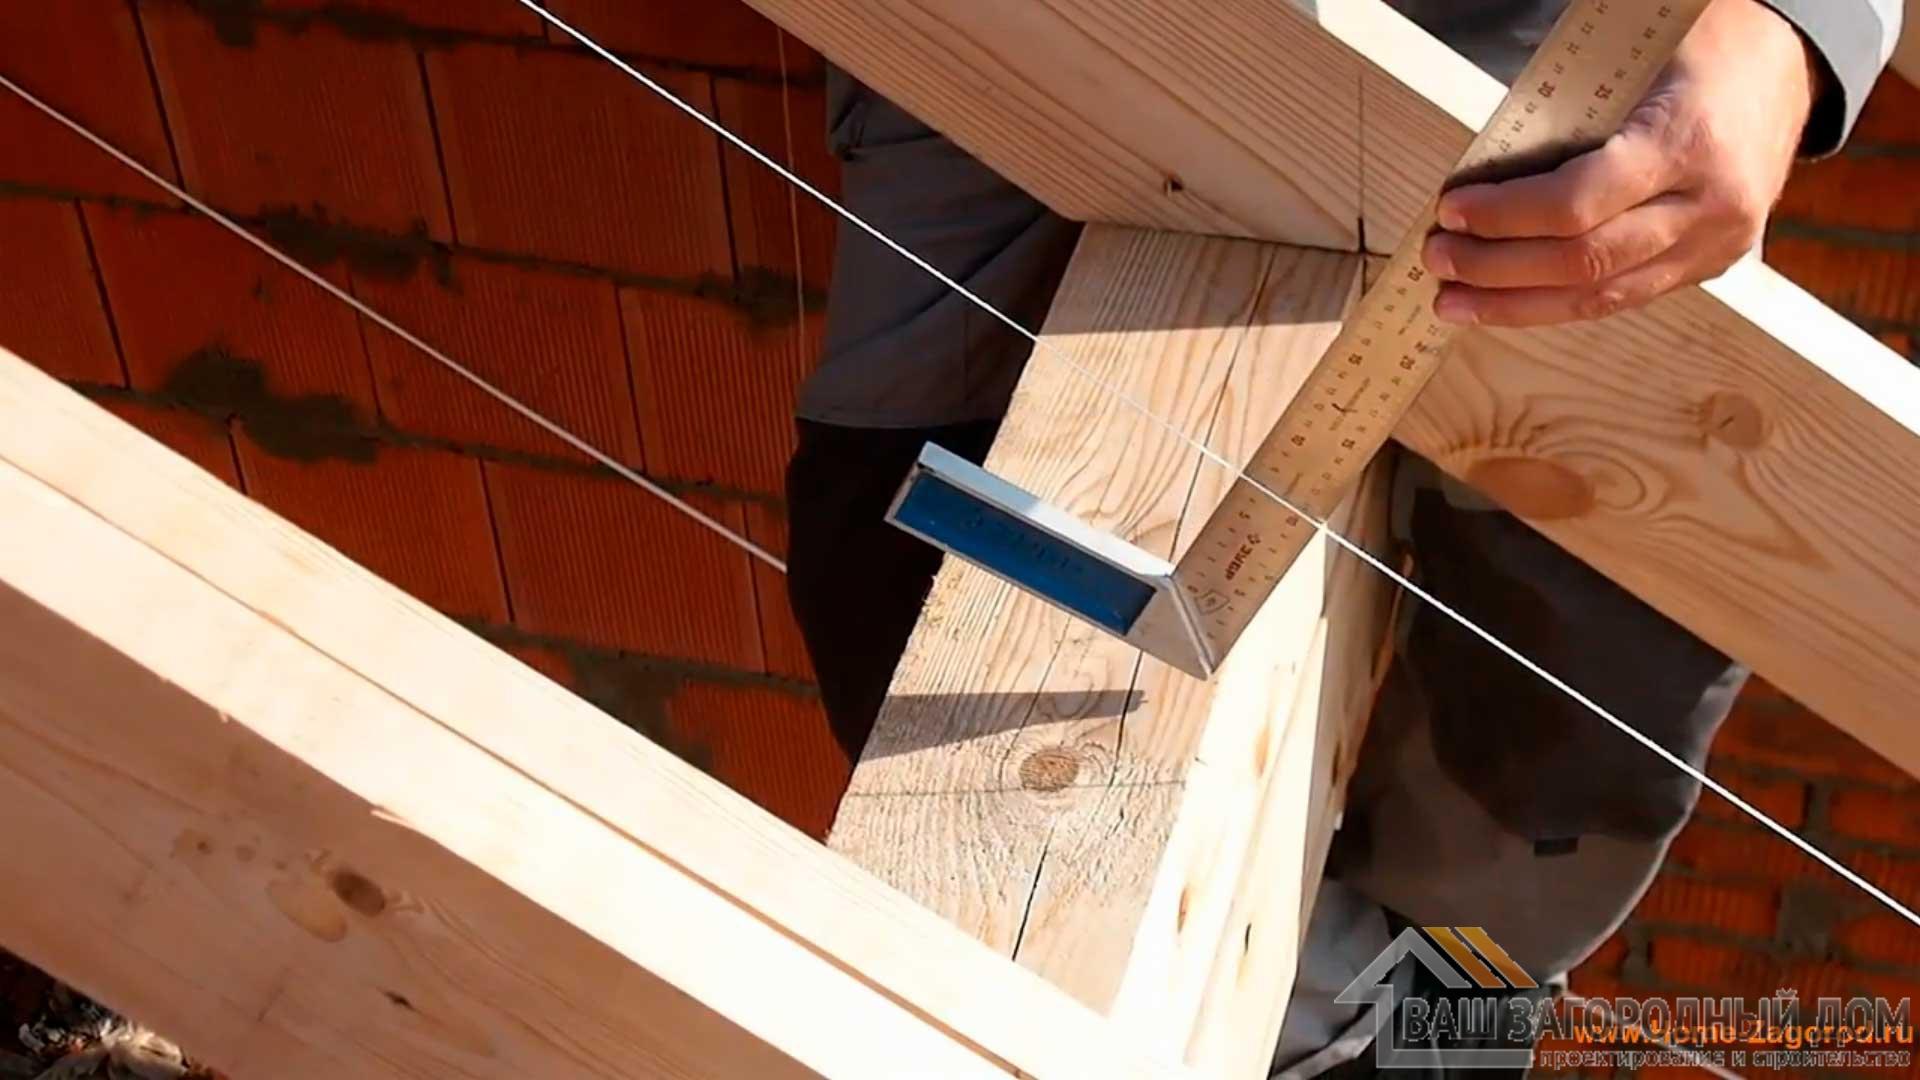 Монтаж крыши дома: крепление стропил к мауэрлату, хребту и балкам